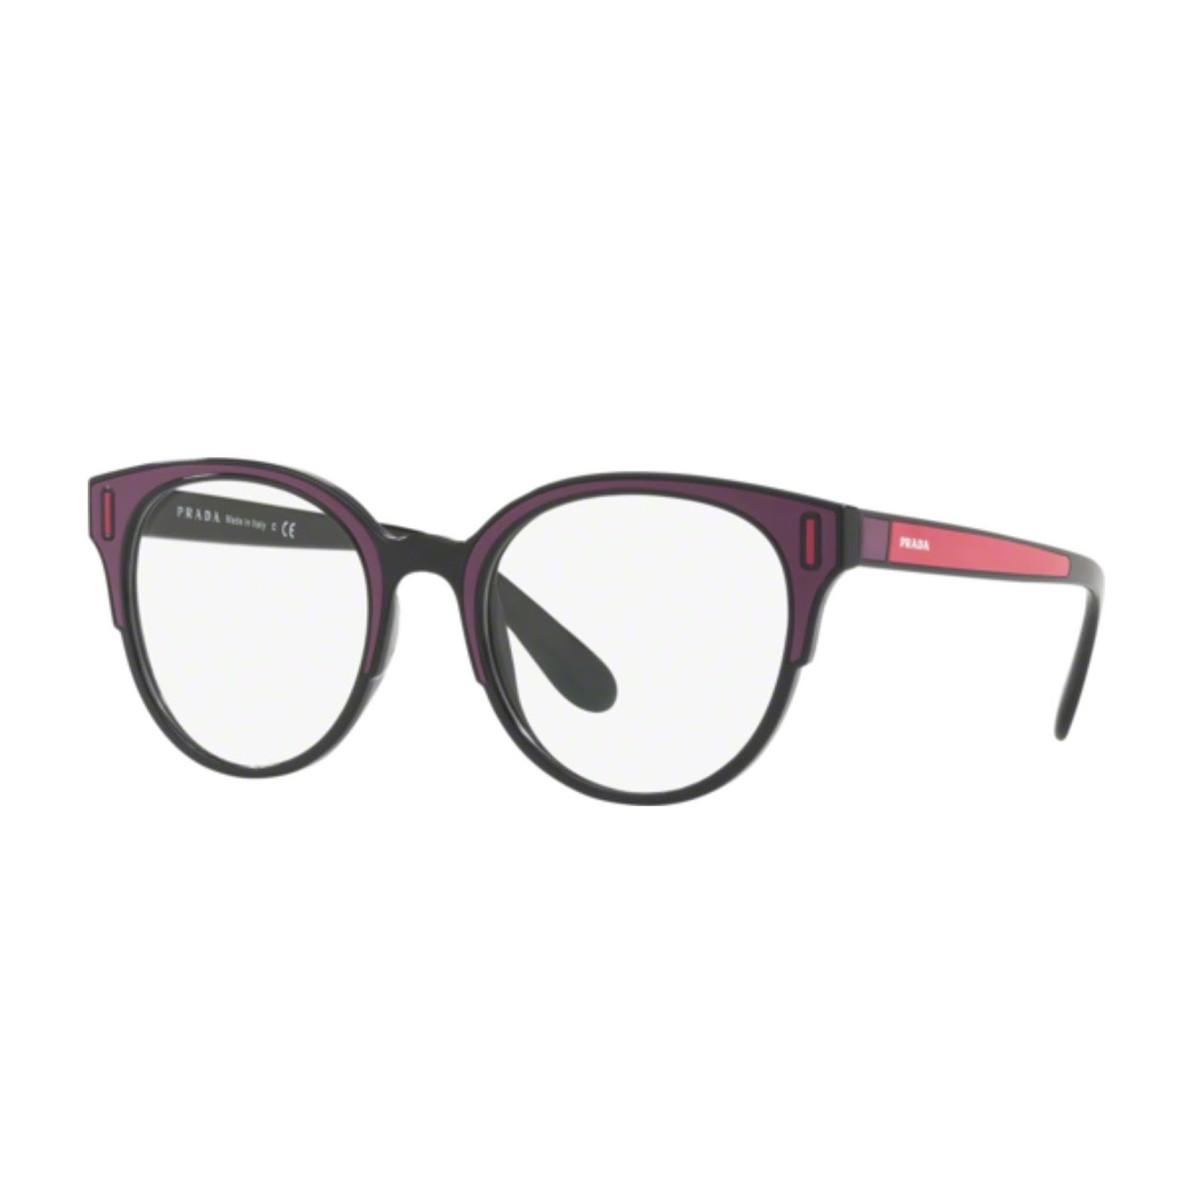 Prada PR 08UV | Women's eyeglasses